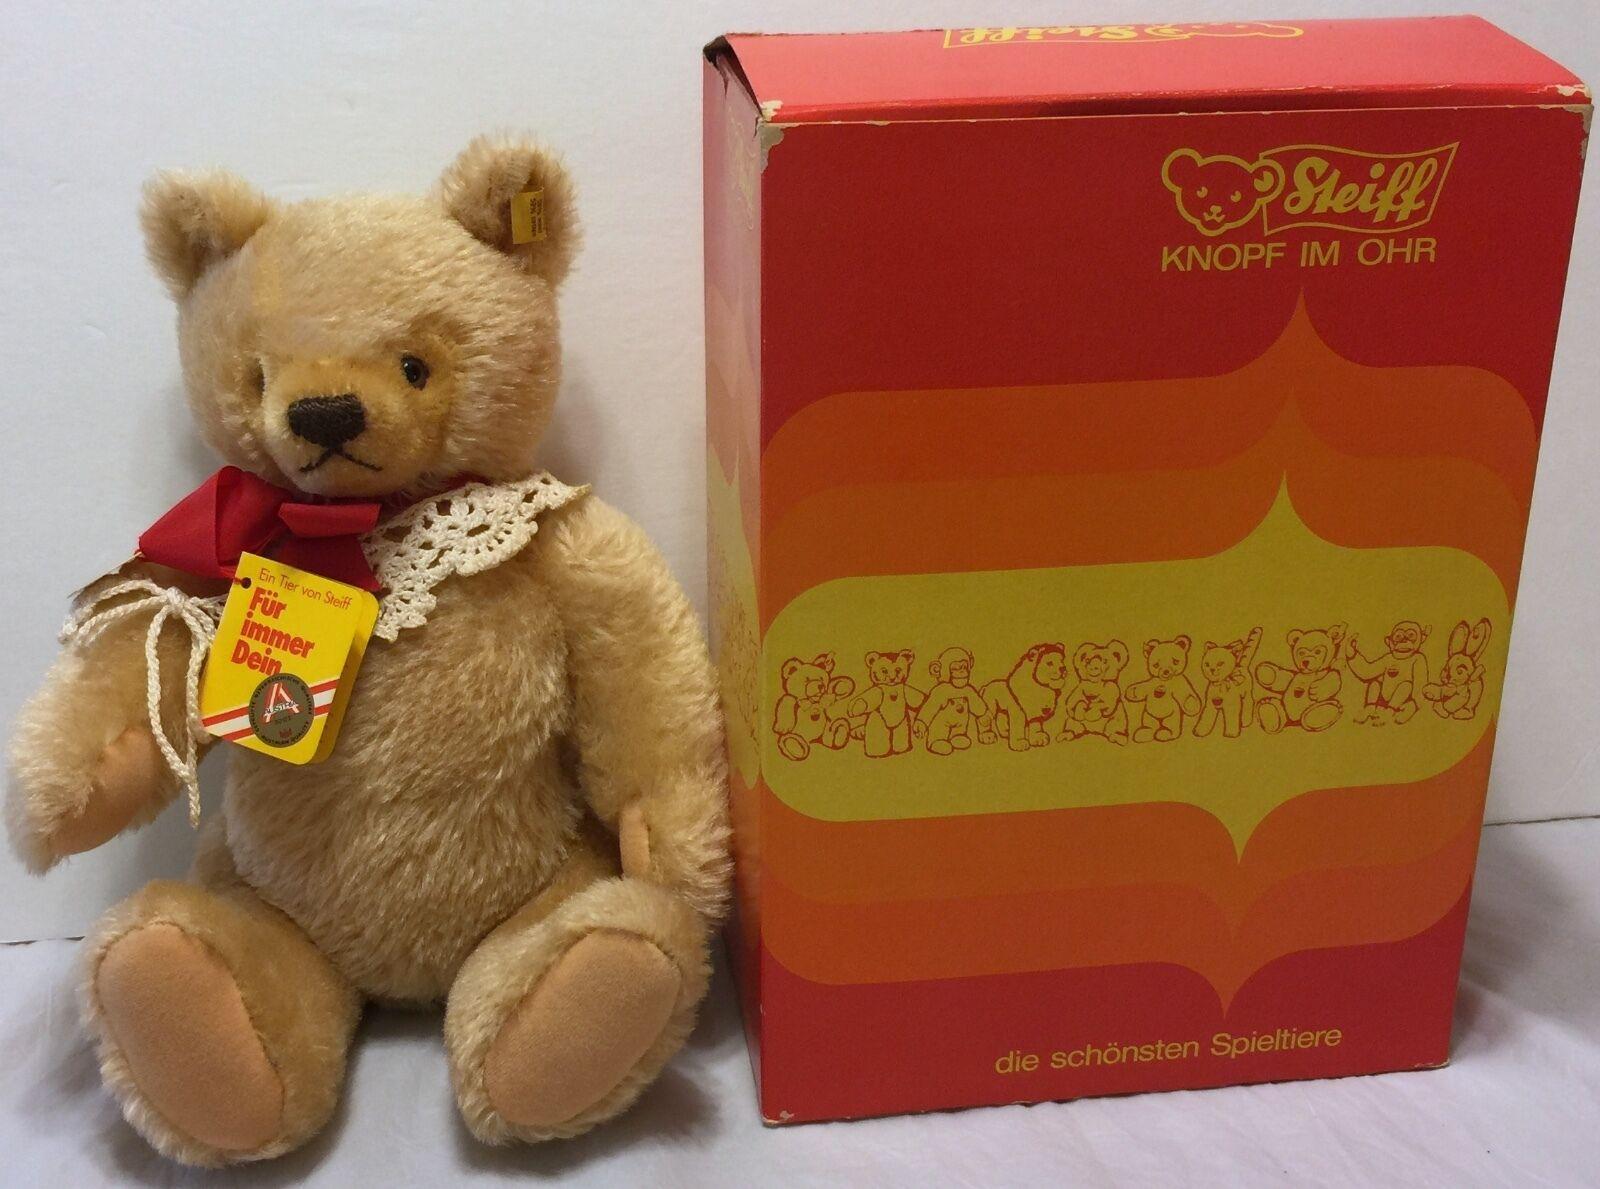 Vintage Steiff 0201/36 Heart Shaped Face Austrian Stuffed Teddy Bear w/Box & Tag